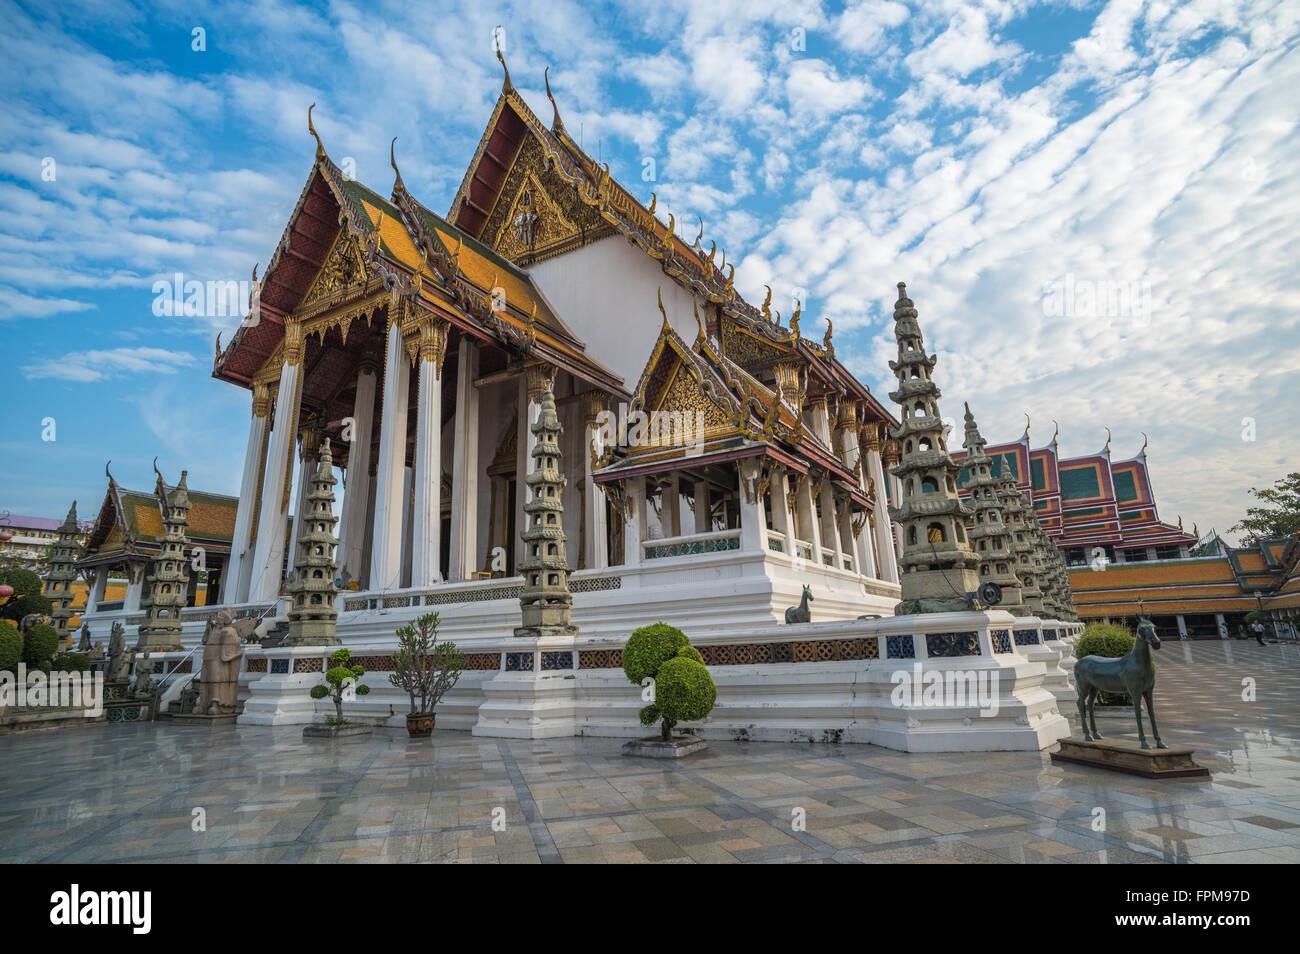 Wat Suthat tempio a Bangkok, in Thailandia Immagini Stock